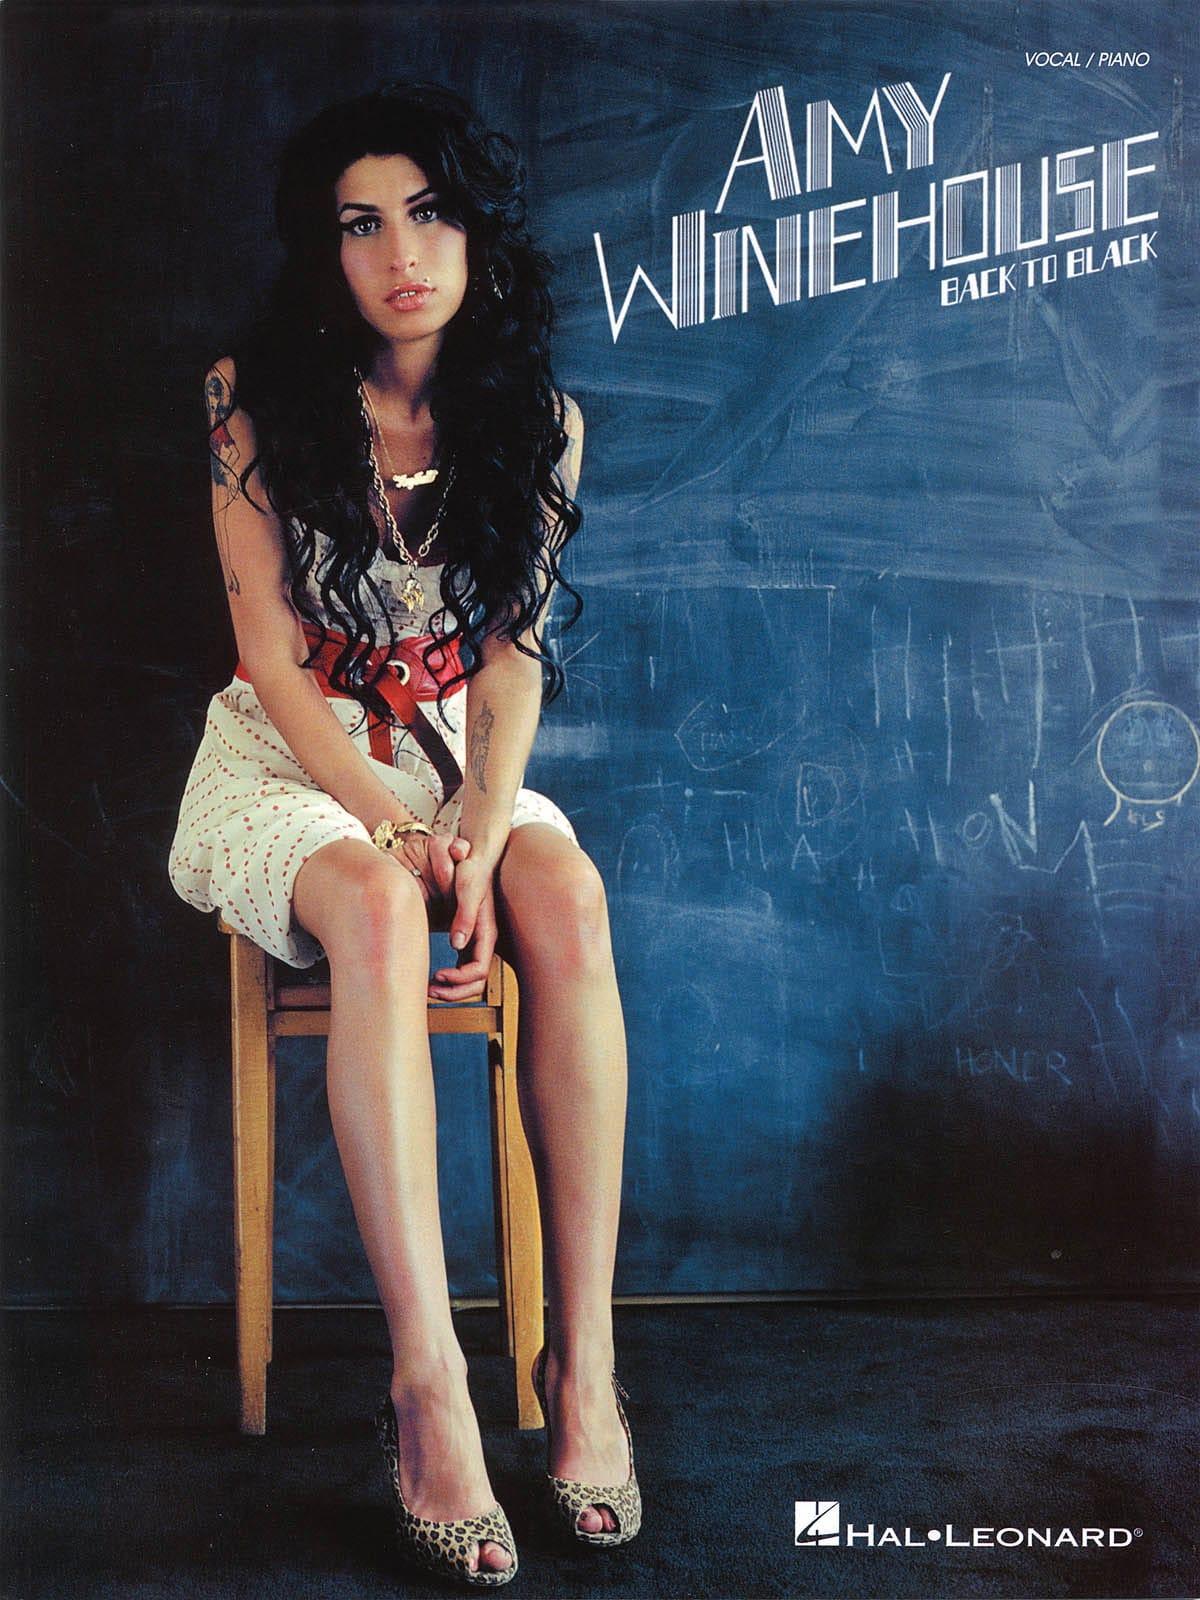 Back To Black - Amy Winehouse - Partition - laflutedepan.com